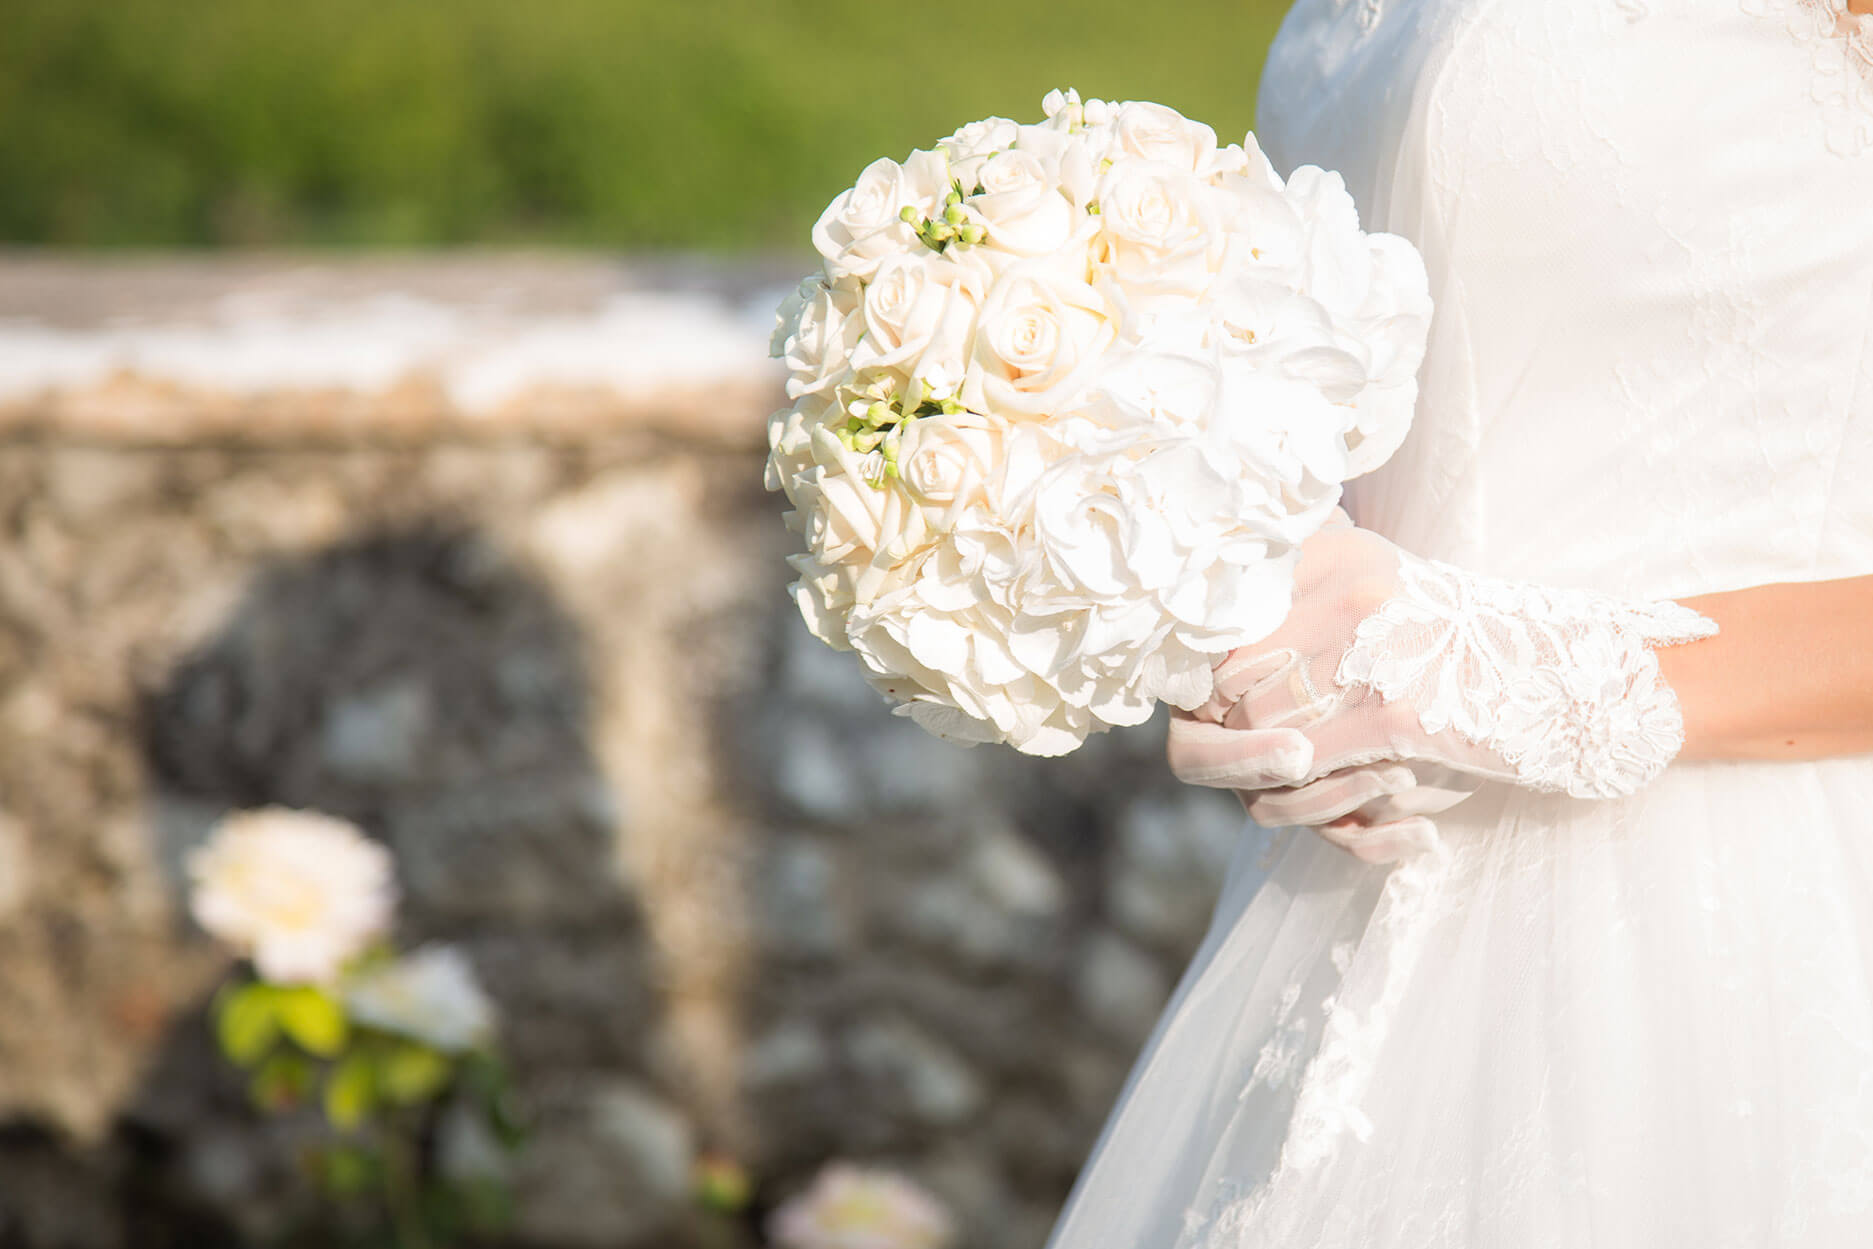 Francesca-Ferrati-wedding-photographer-Verona-Svetlana-Gianluigi23